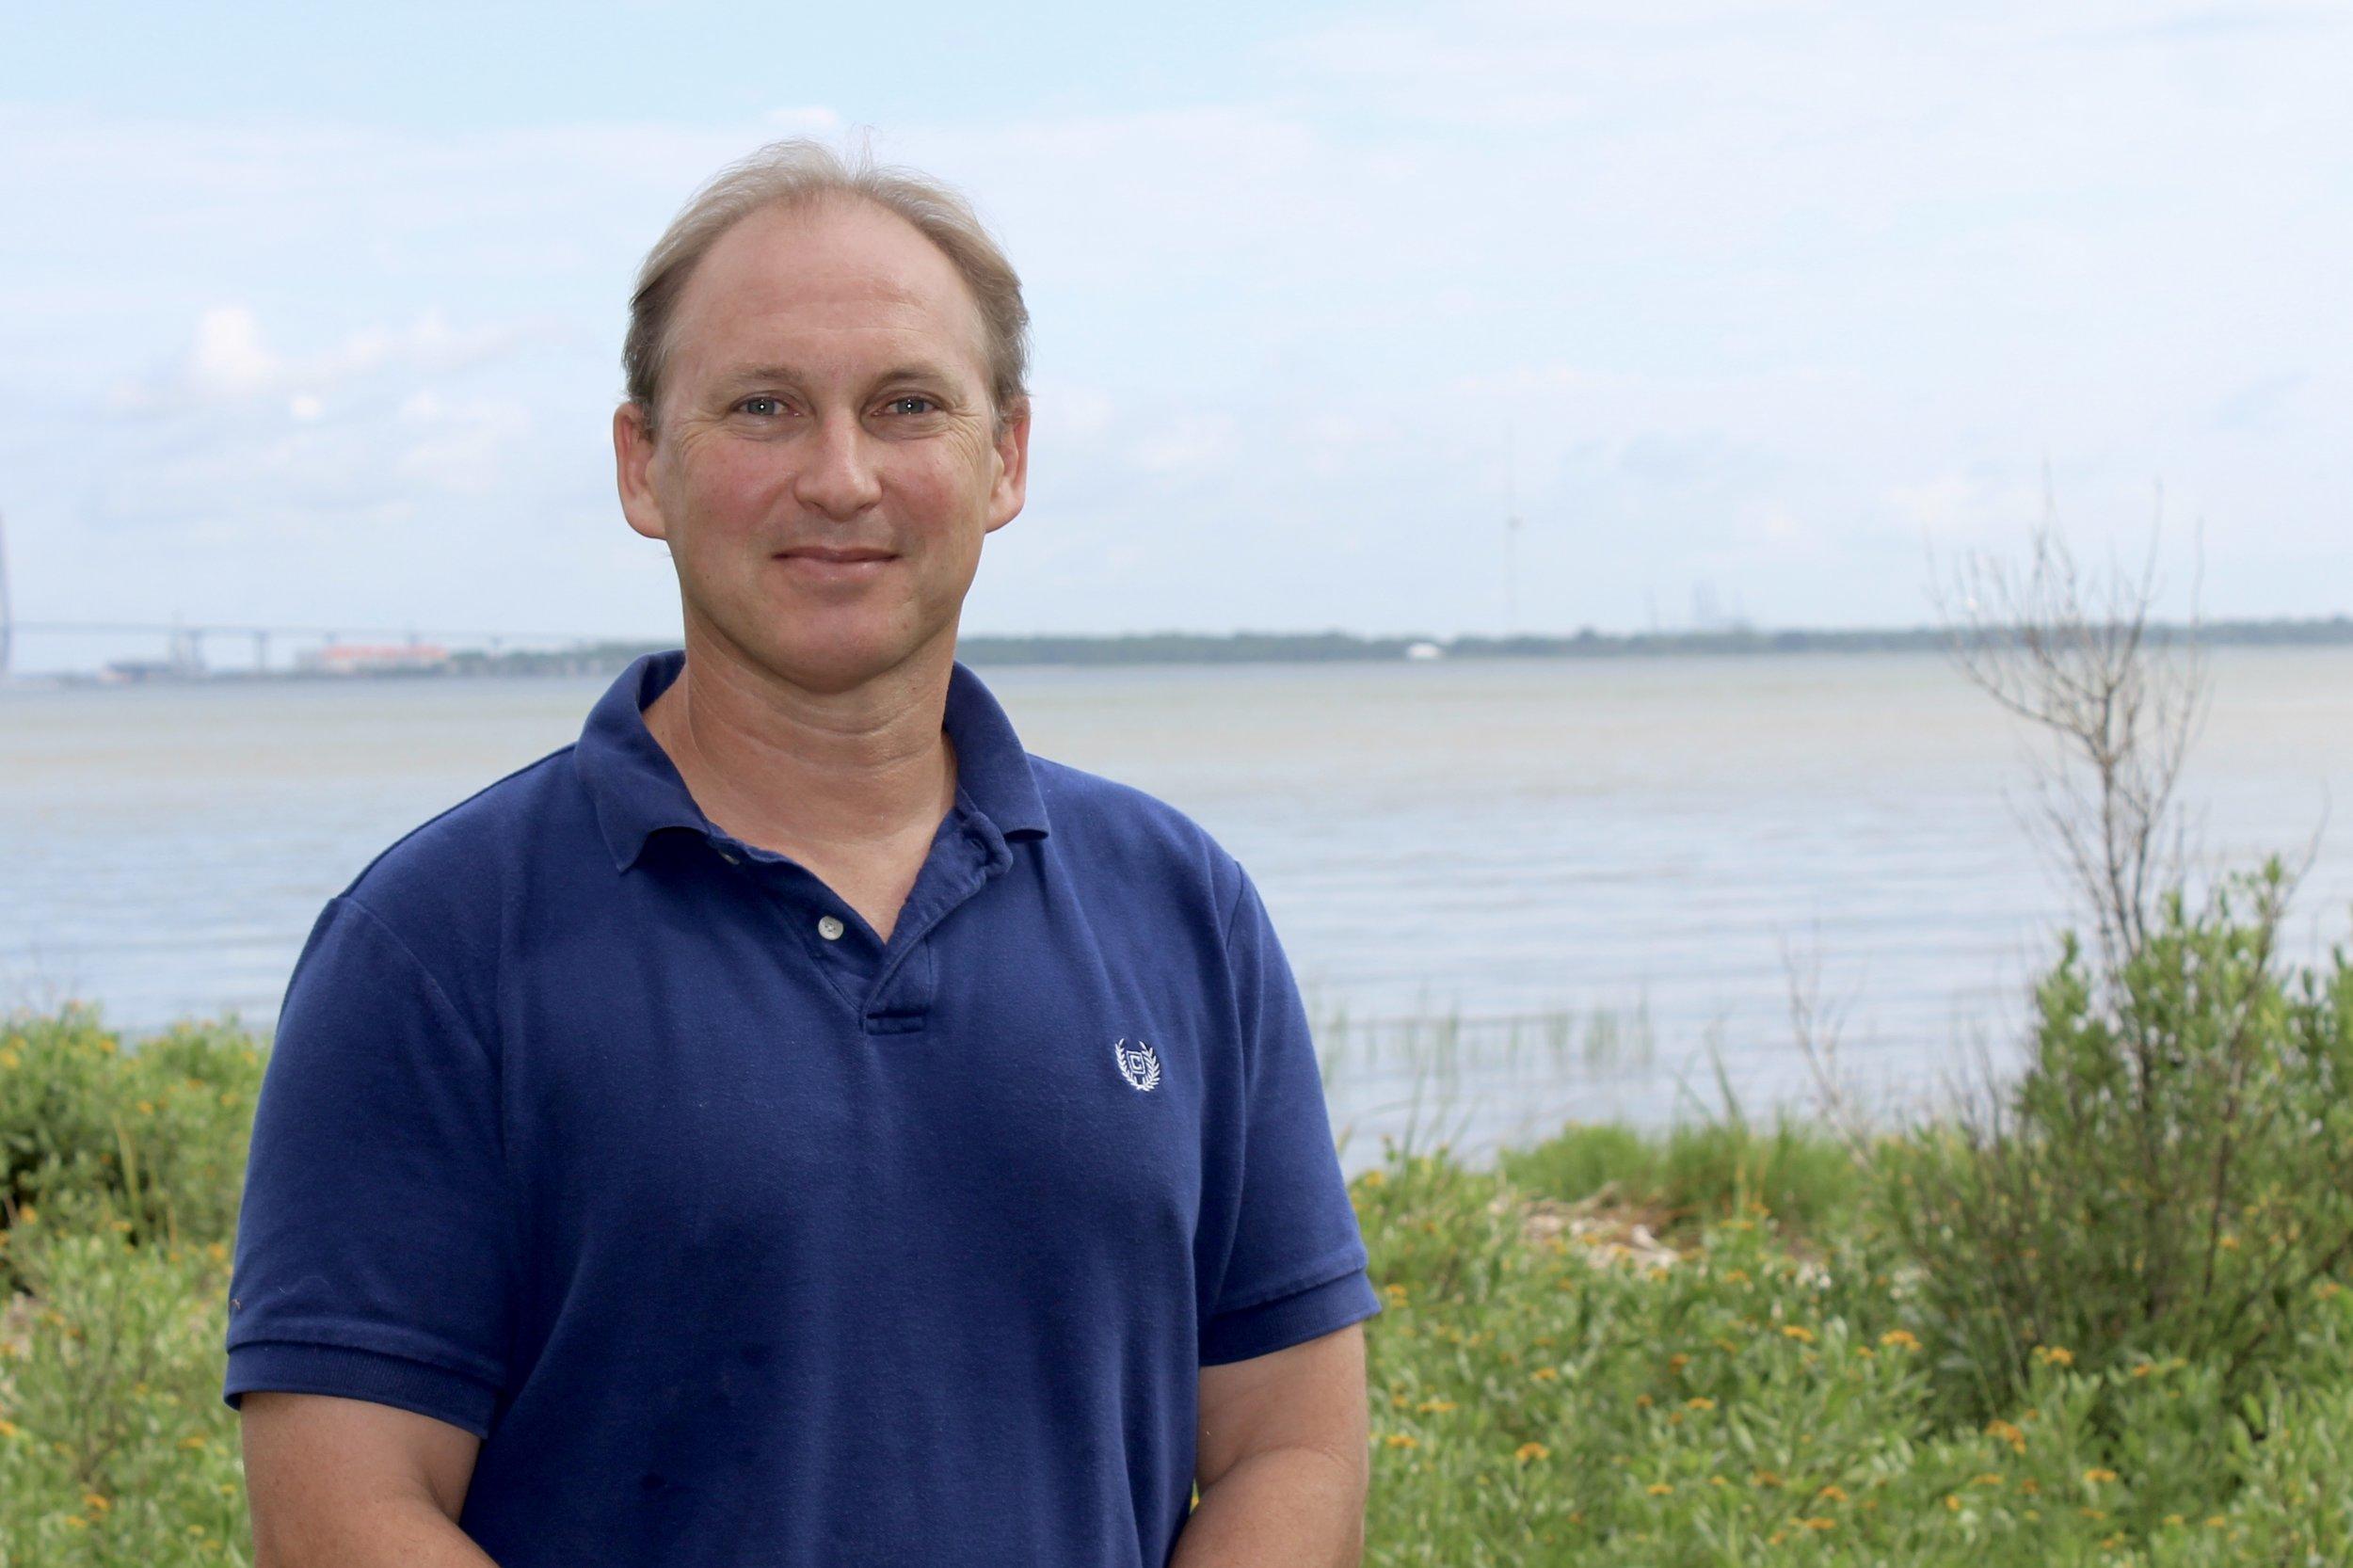 Steve Arnott's home base is SCDNR's Marine Resources Center in Charleston.(Photo: E. Weeks/SCDNR)